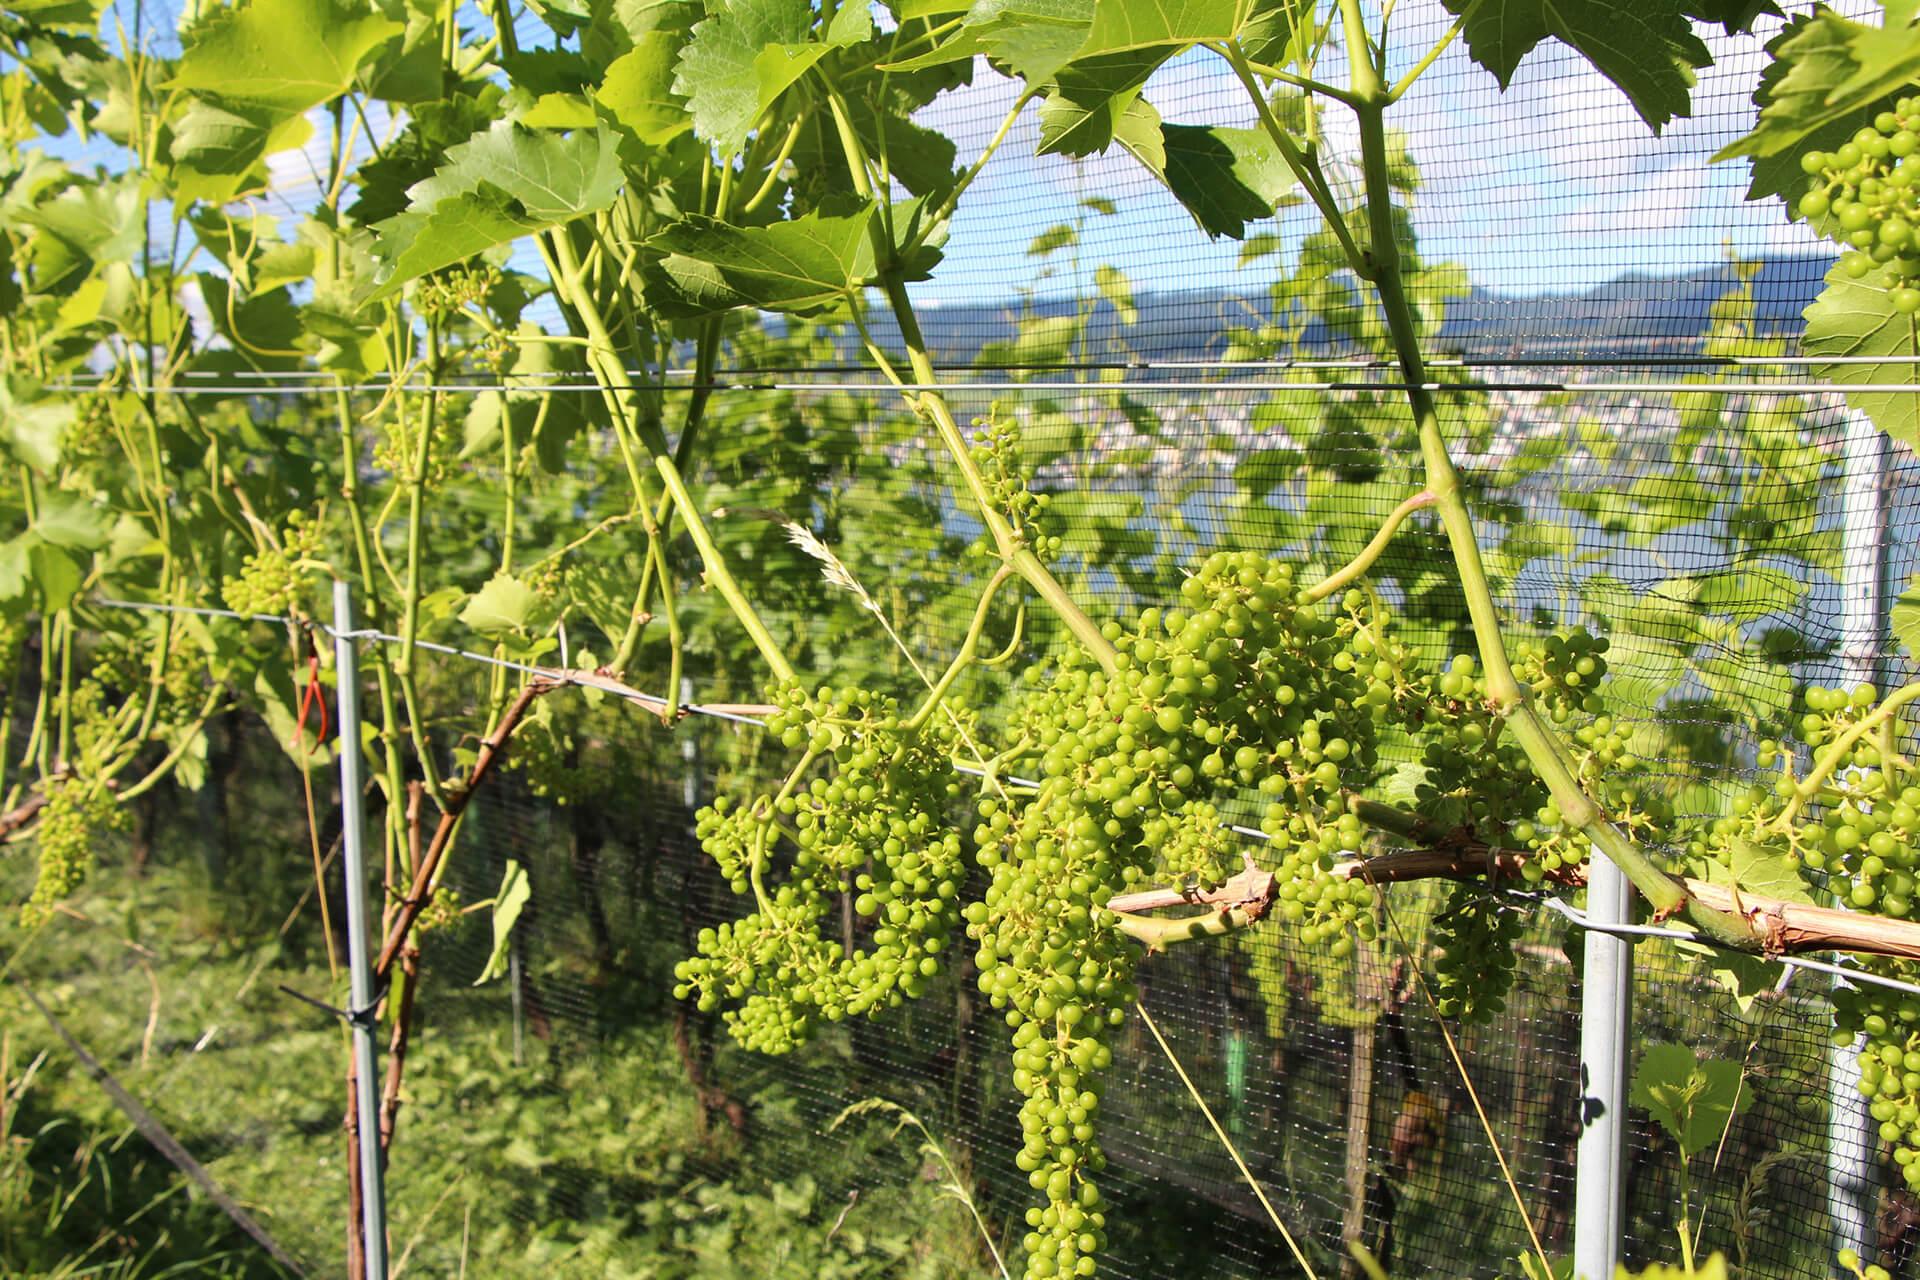 Grüne Trauben im Piwi-Rebberg.